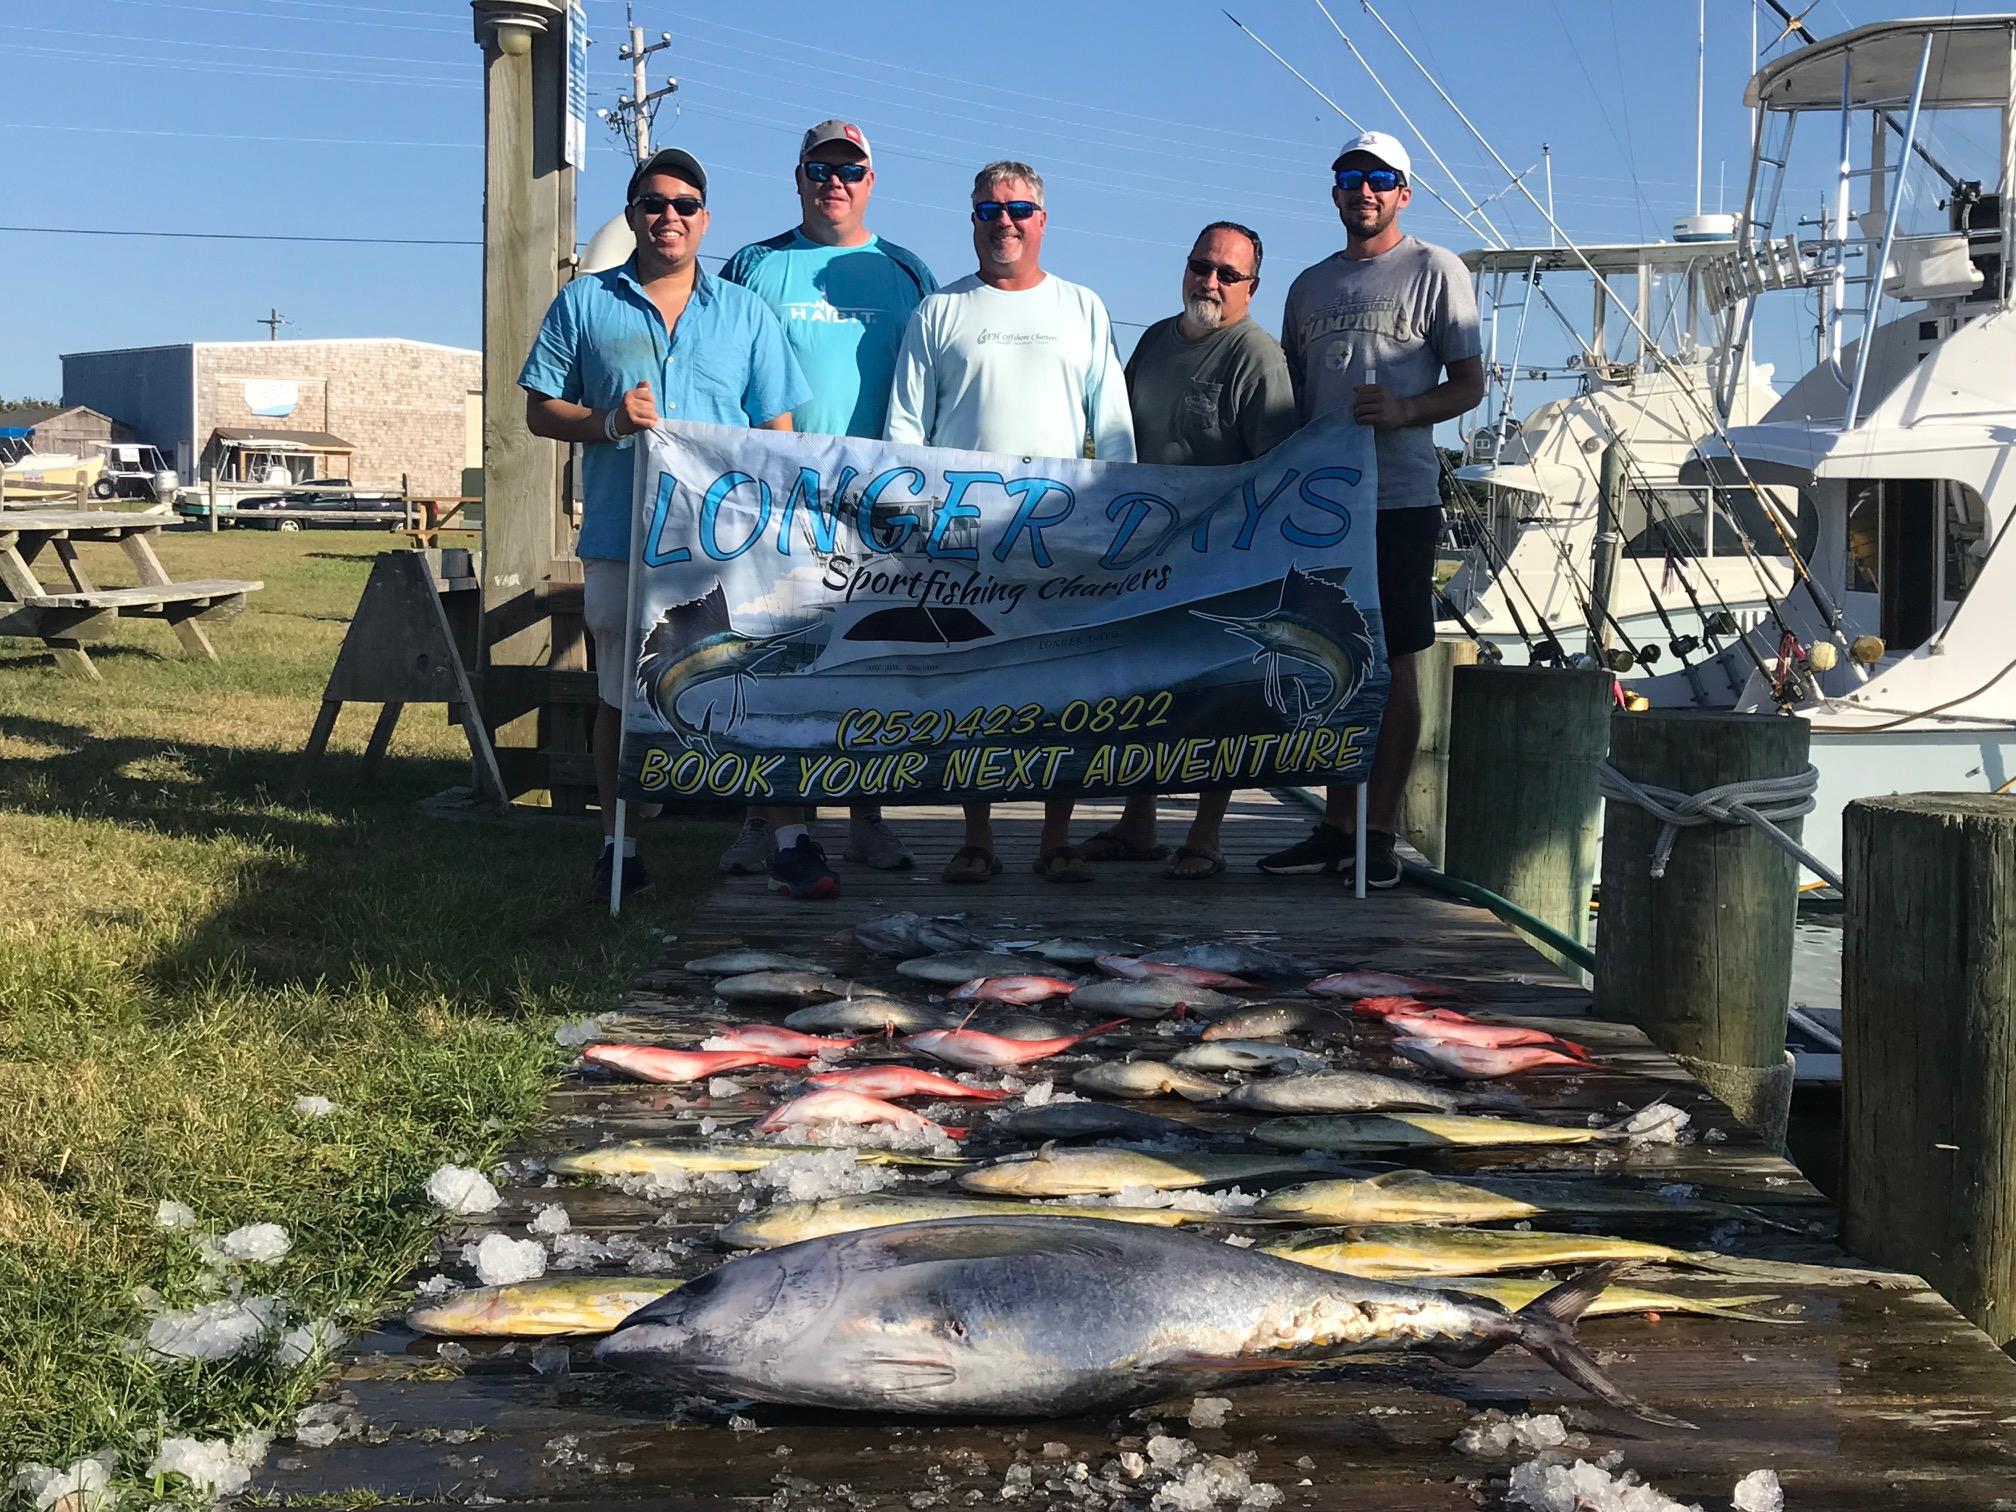 Longer Days Sportfishing Charters Hatteras, NC